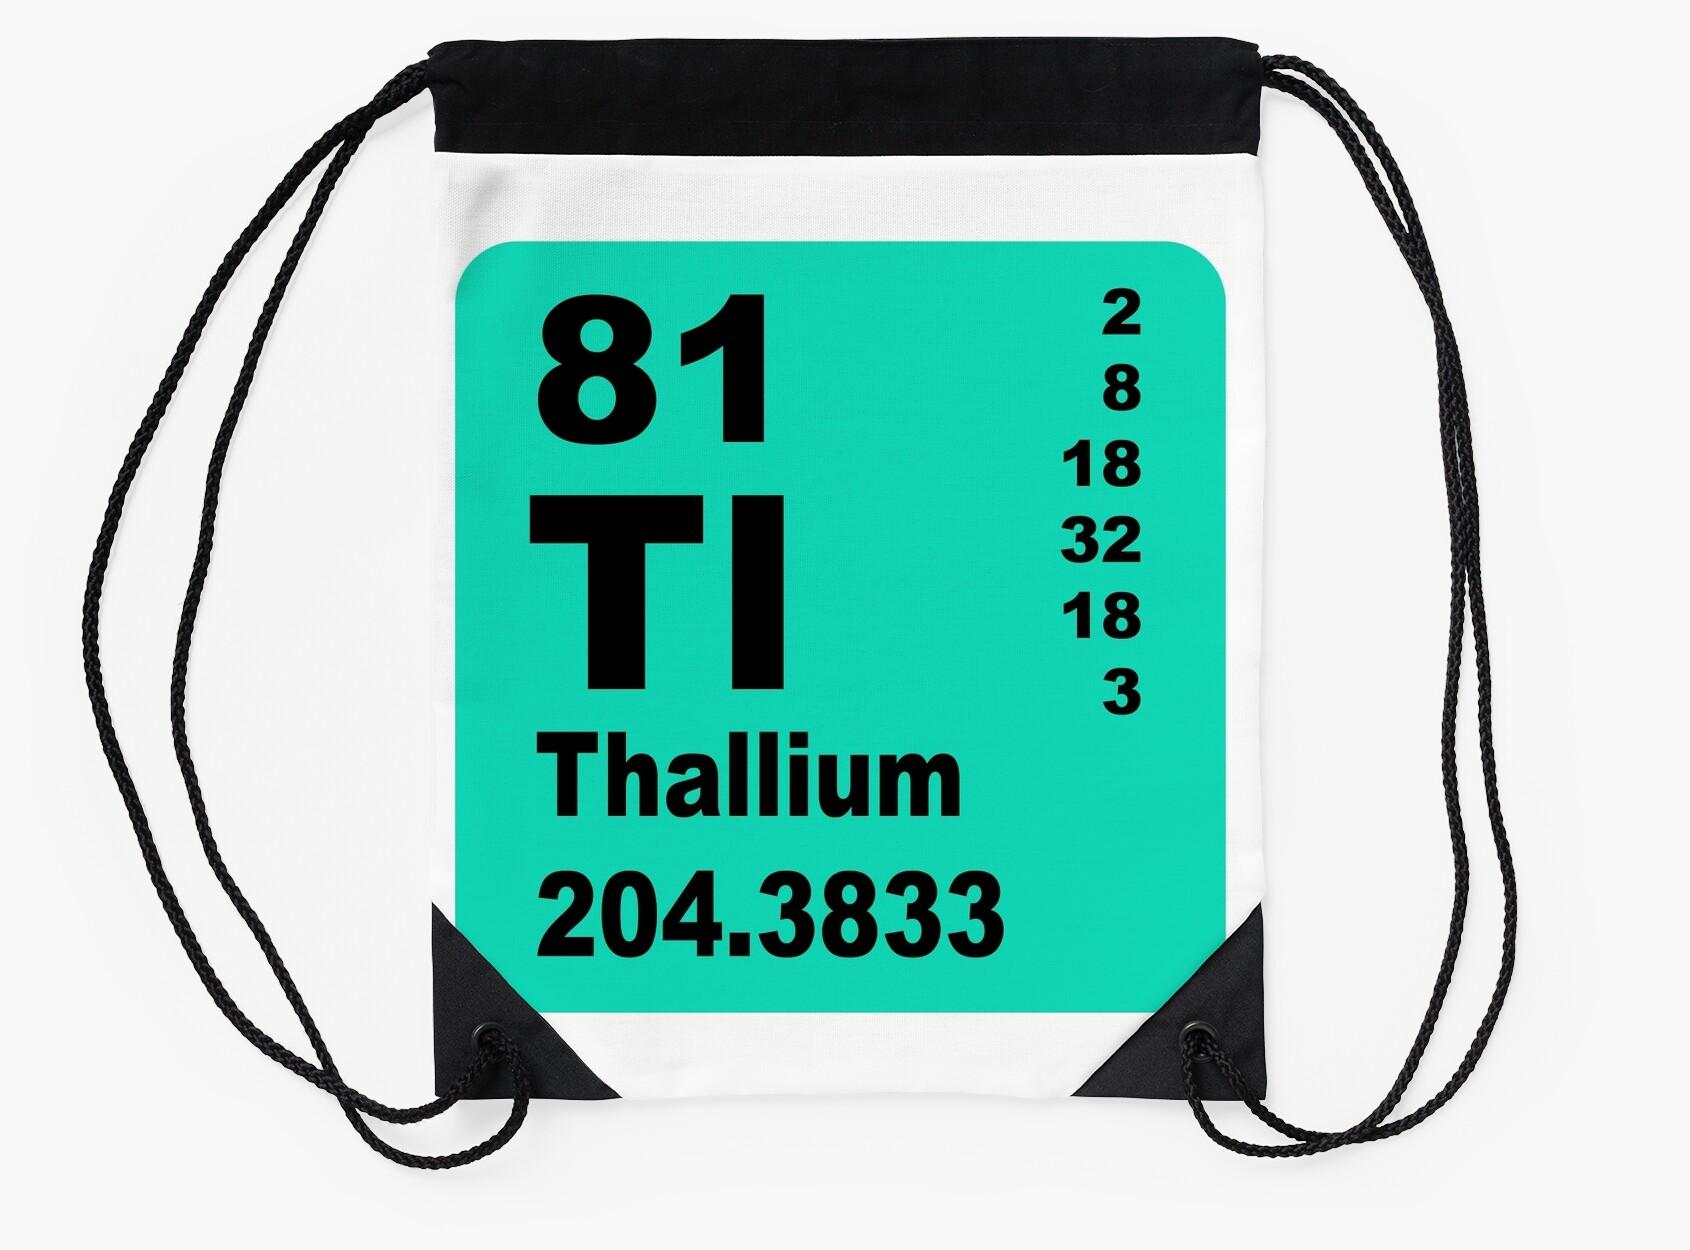 Thallium periodic table of elements drawstring bags by thallium periodic table of elements gamestrikefo Images